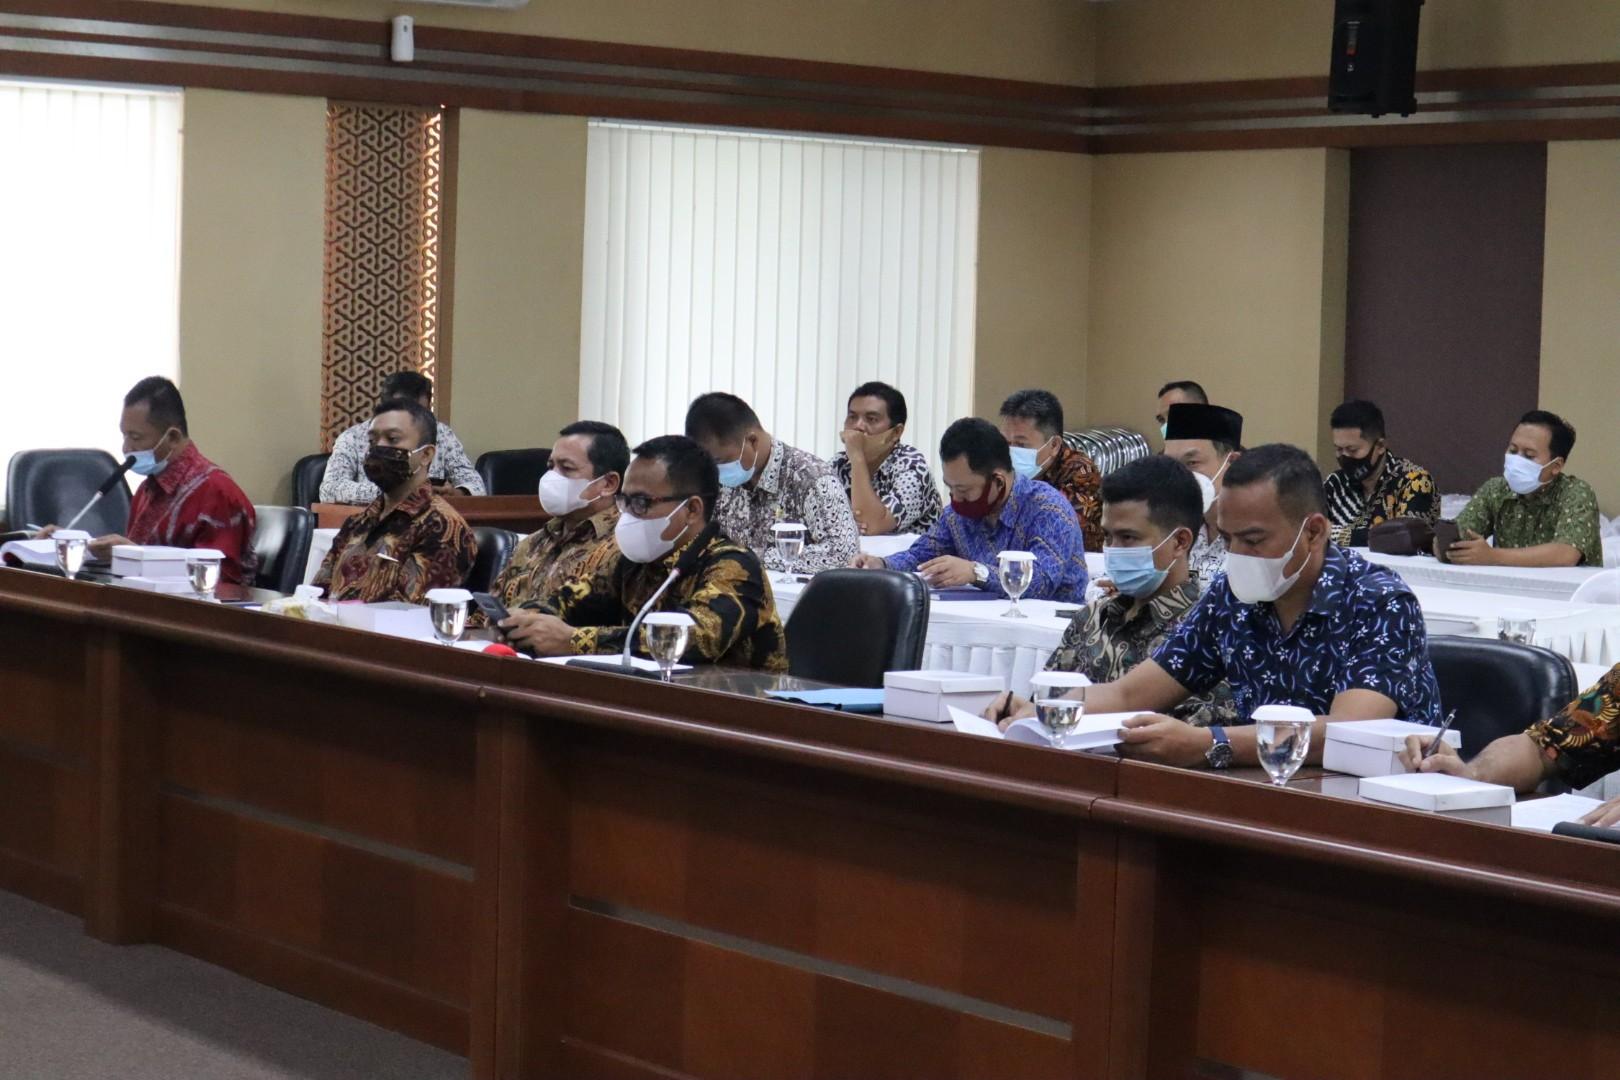 Kabupaten Purwakarta Mulai Uji Proses Pembelajaran Tatap Muka